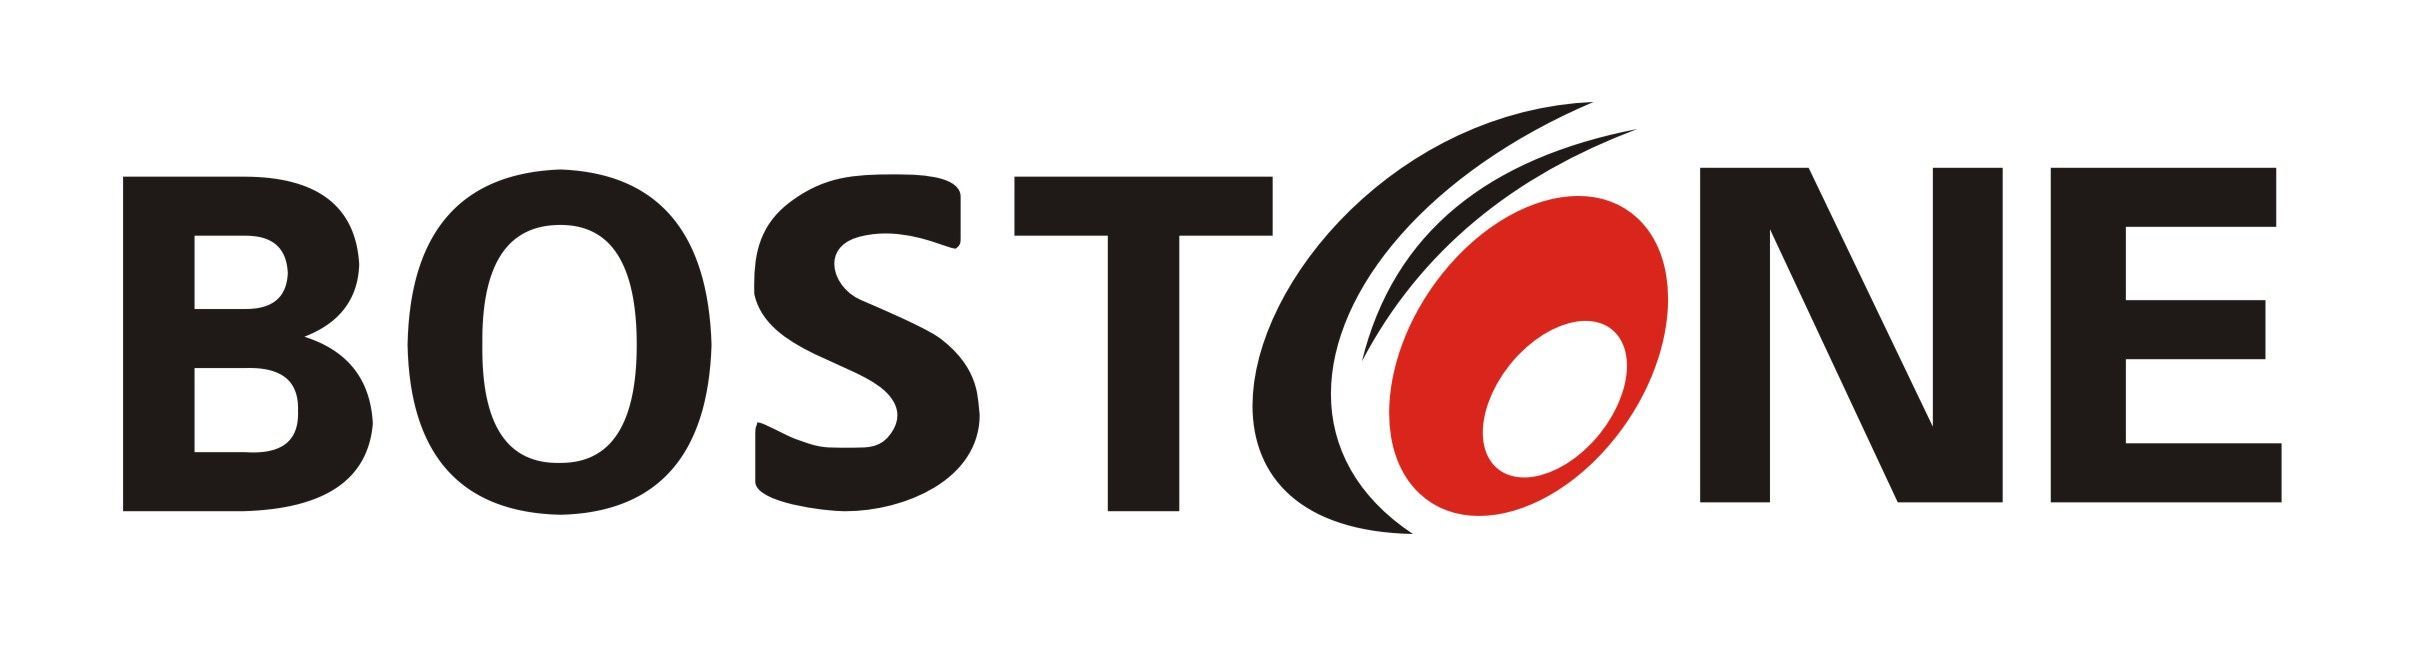 Qingdao Bostone Tyre Co., Ltd